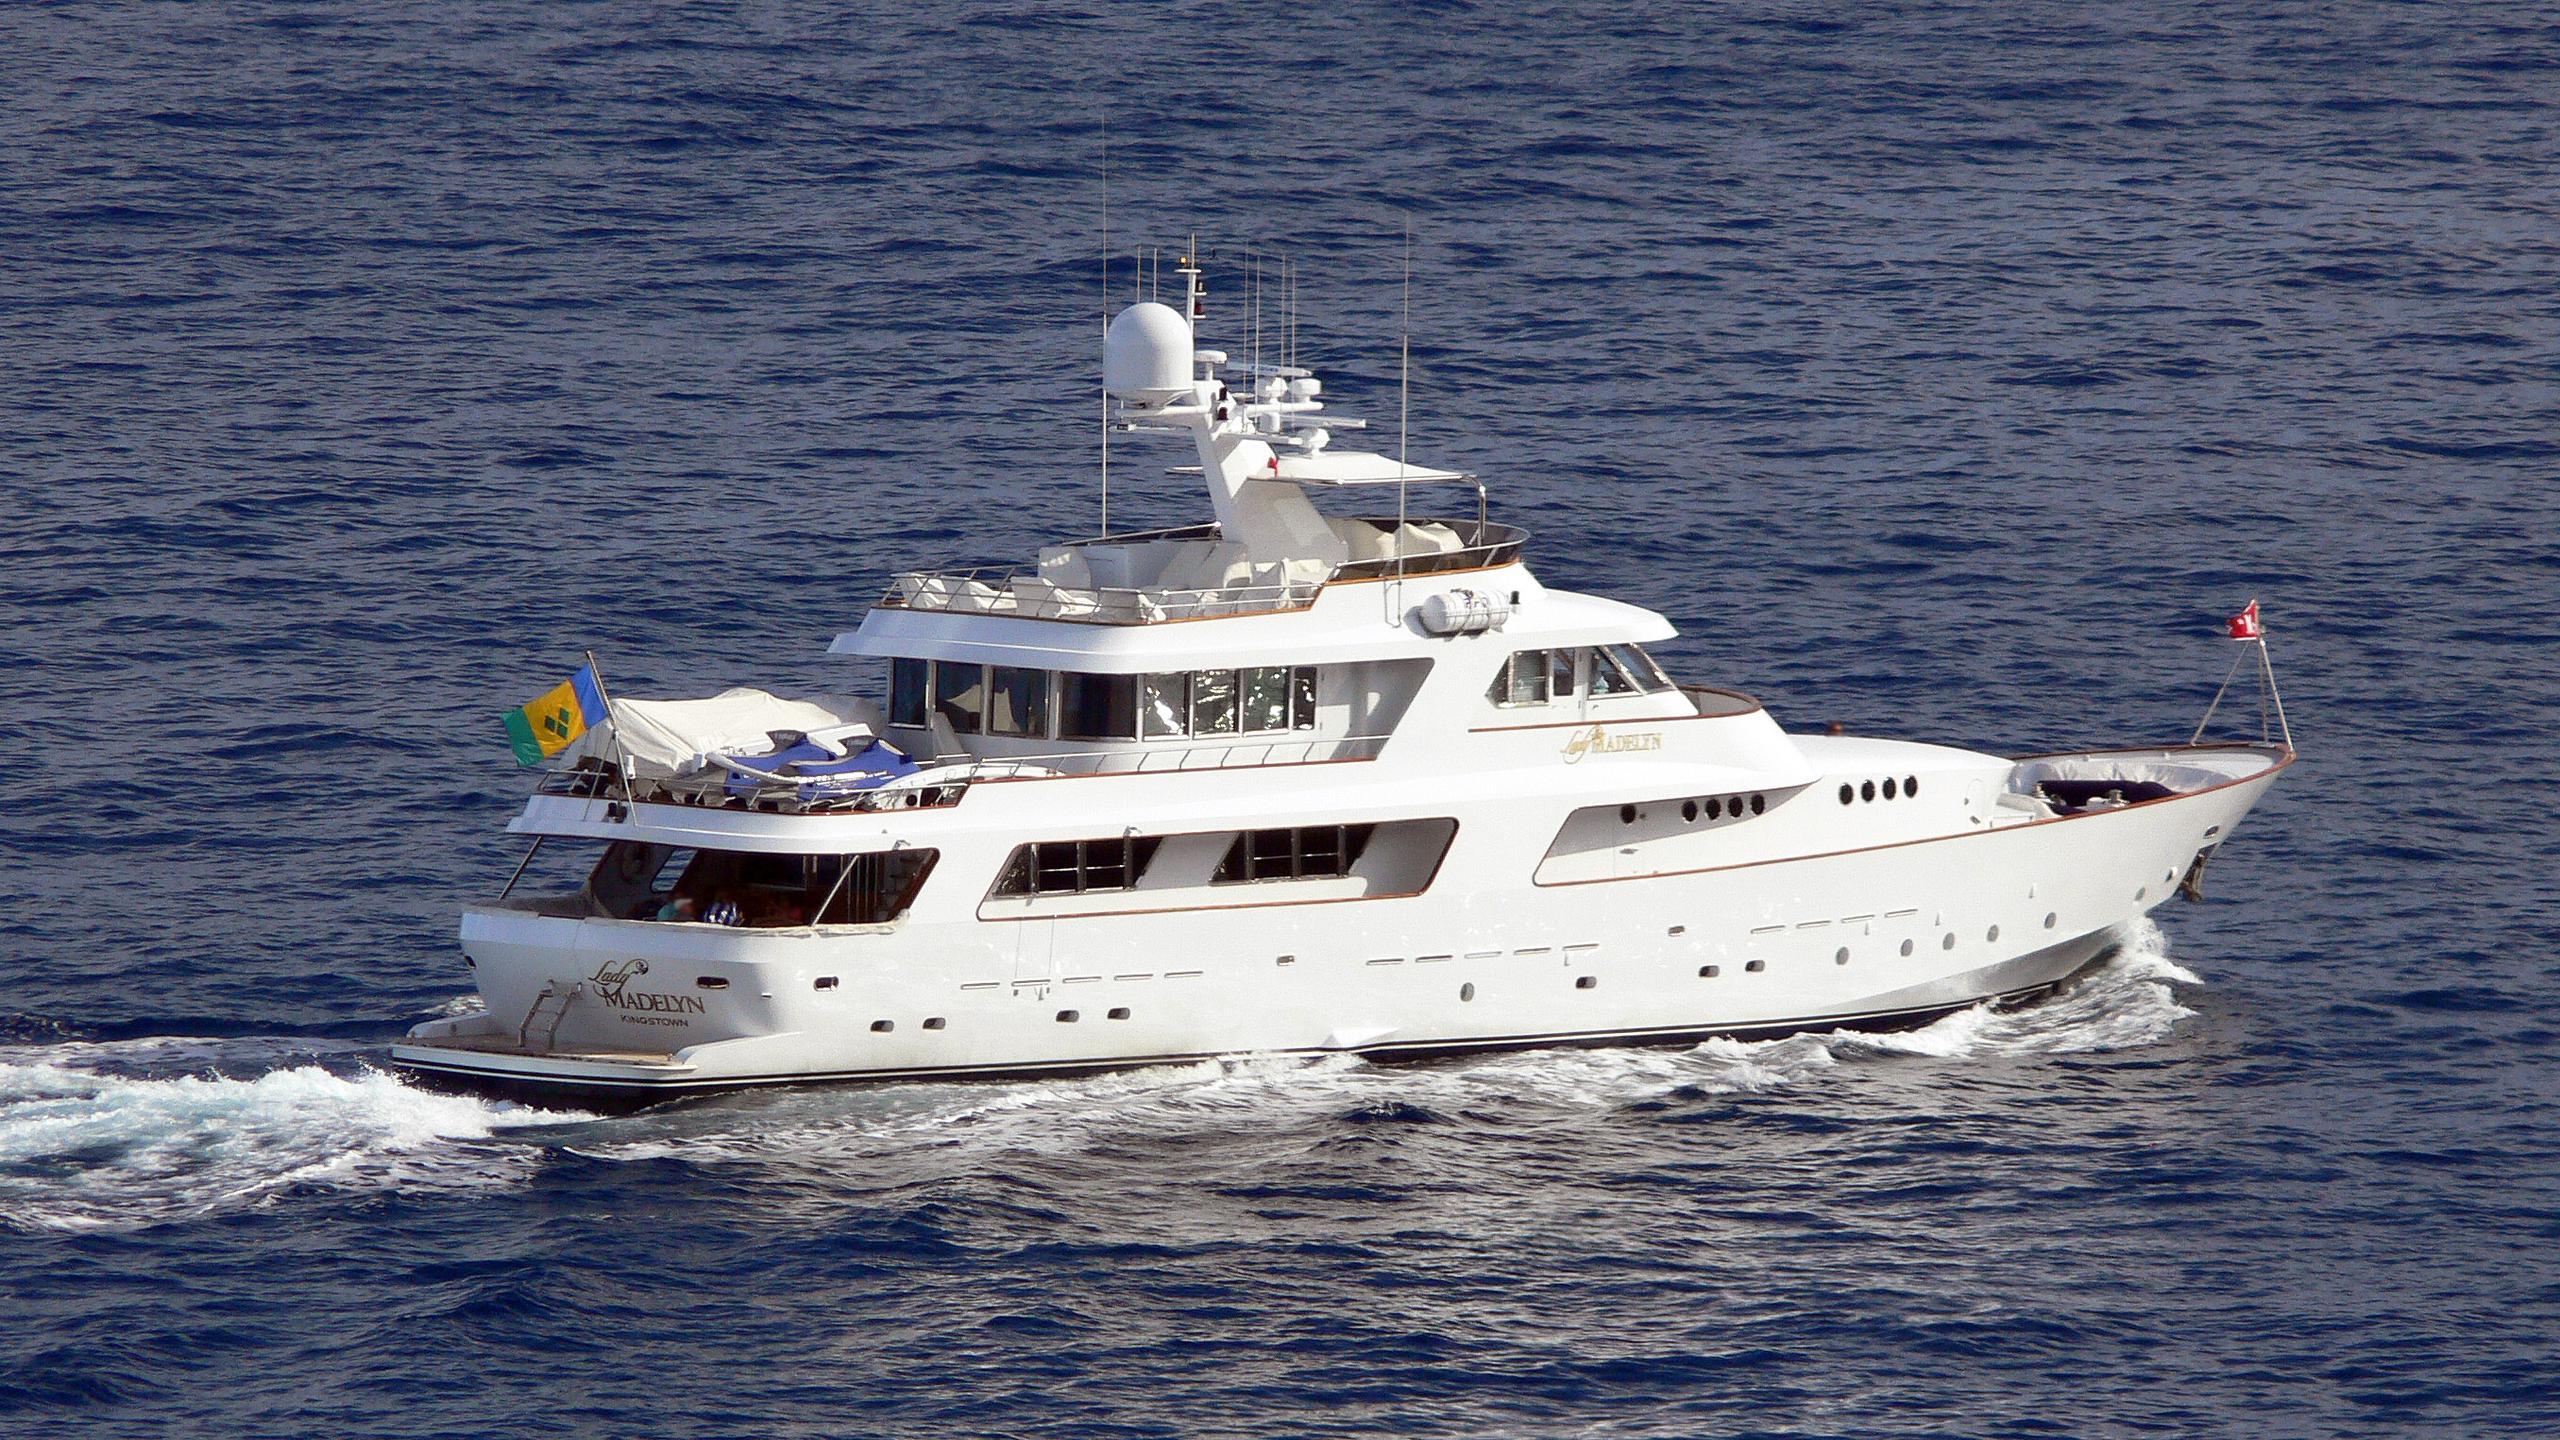 nordic-star-motor-yacht-crn-1978-37m-running-stern